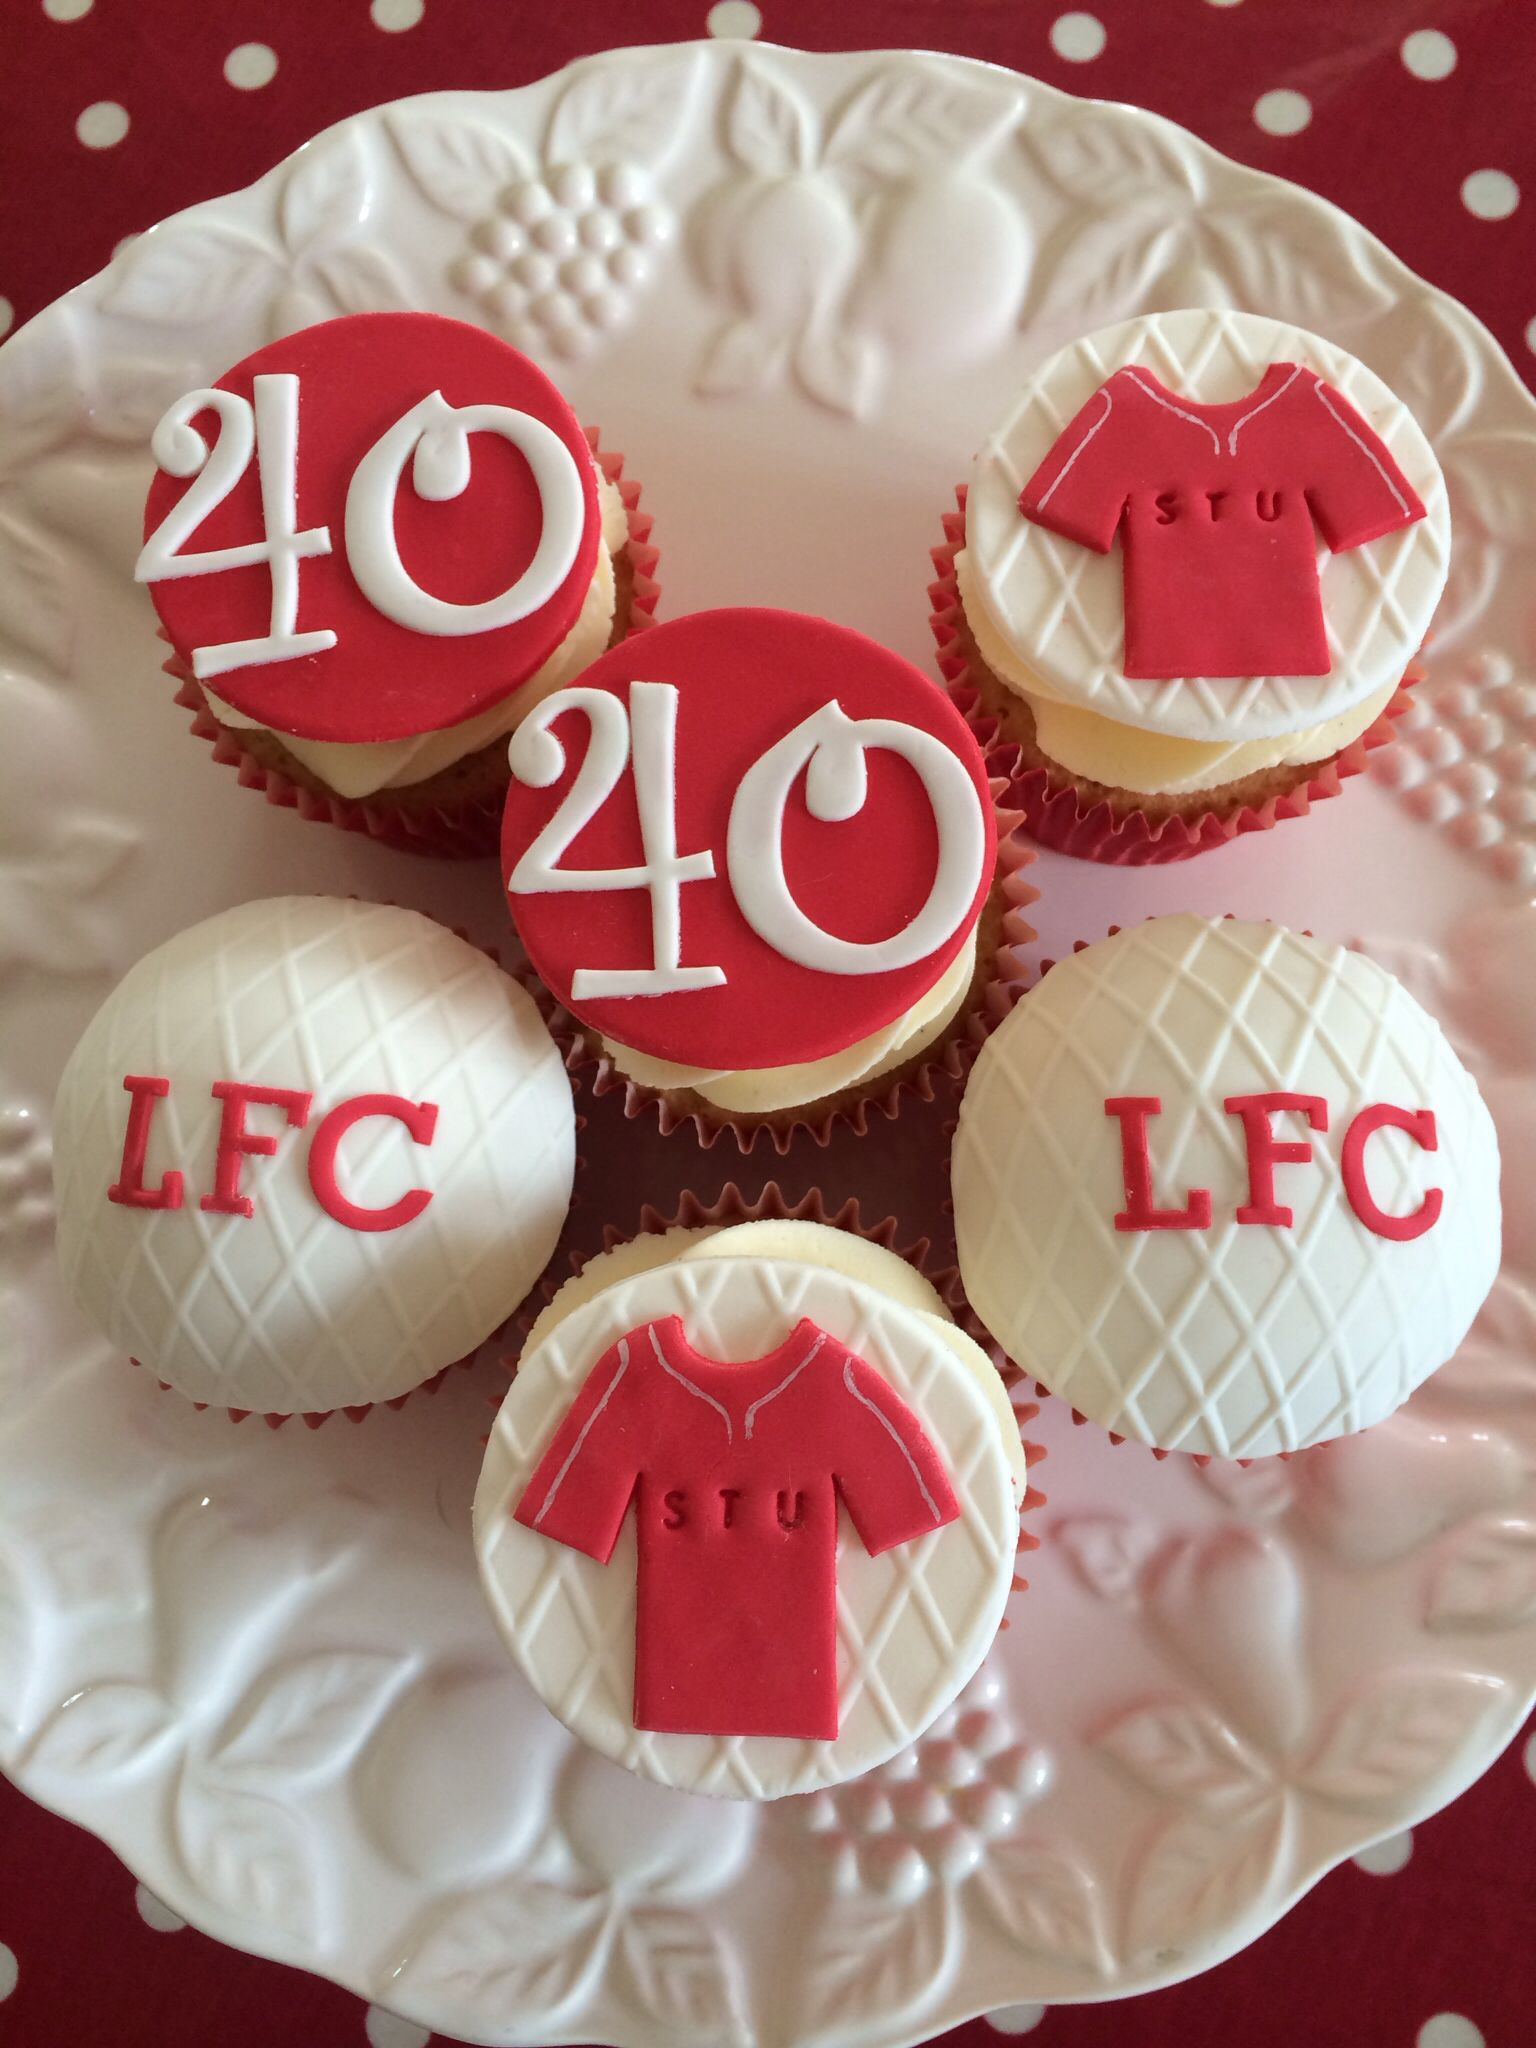 Liverpool cupcakes | Cake, Cupcakes, Liverpool